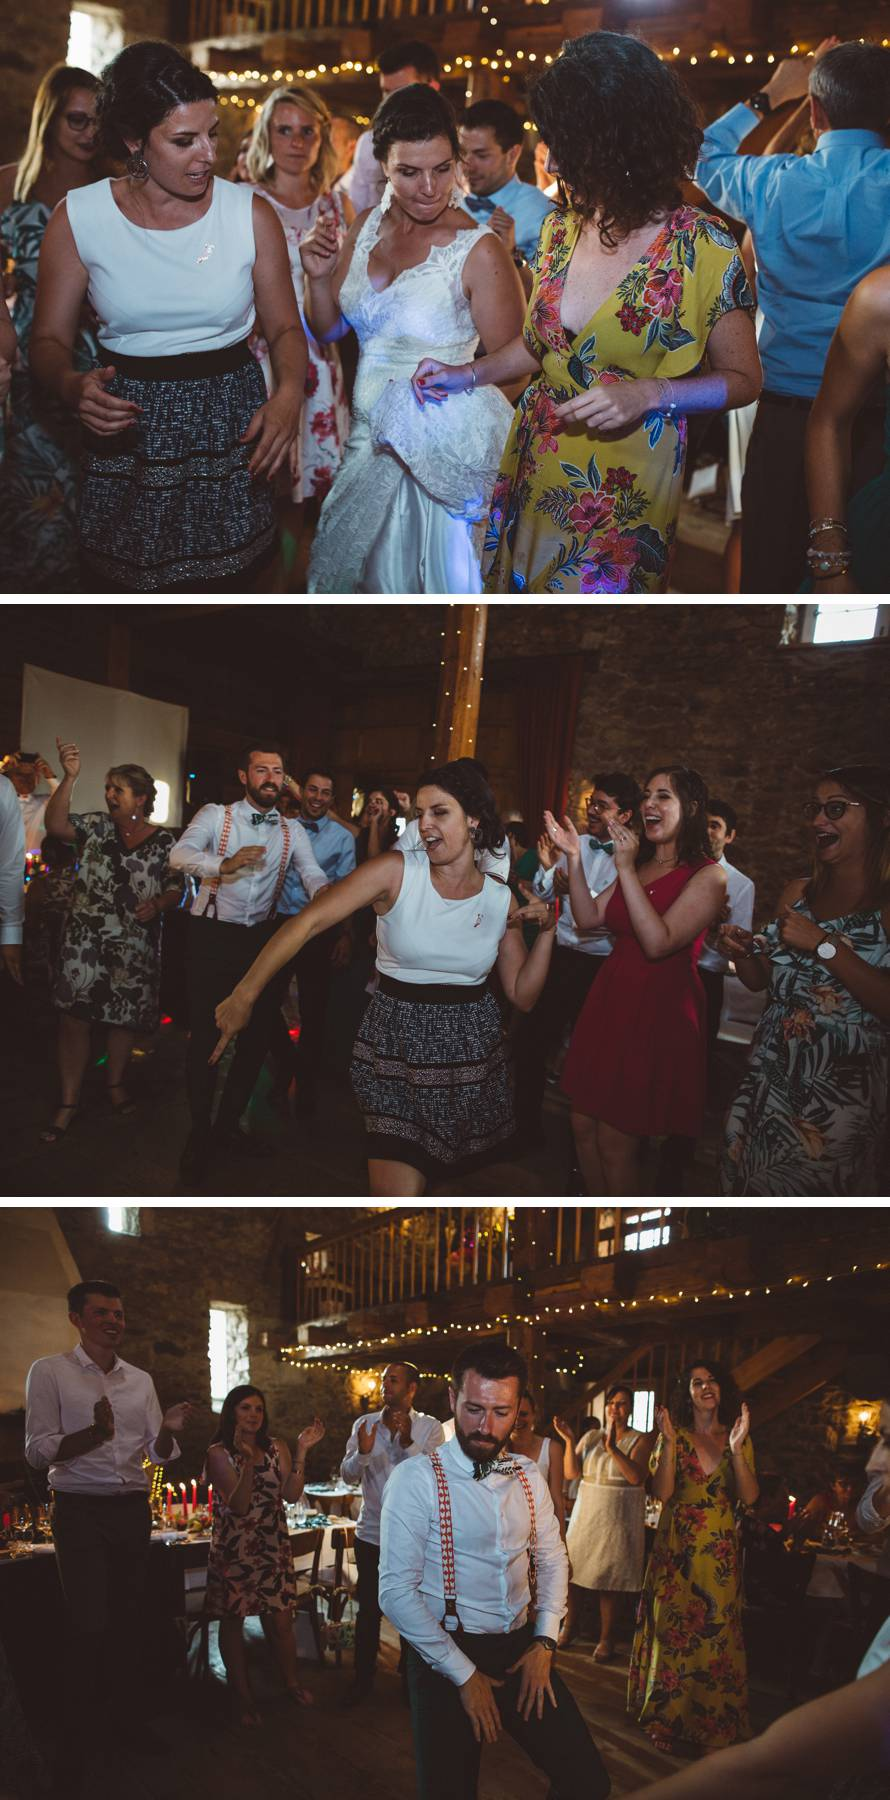 mariage-tropical-raben-horben_0031.jpg